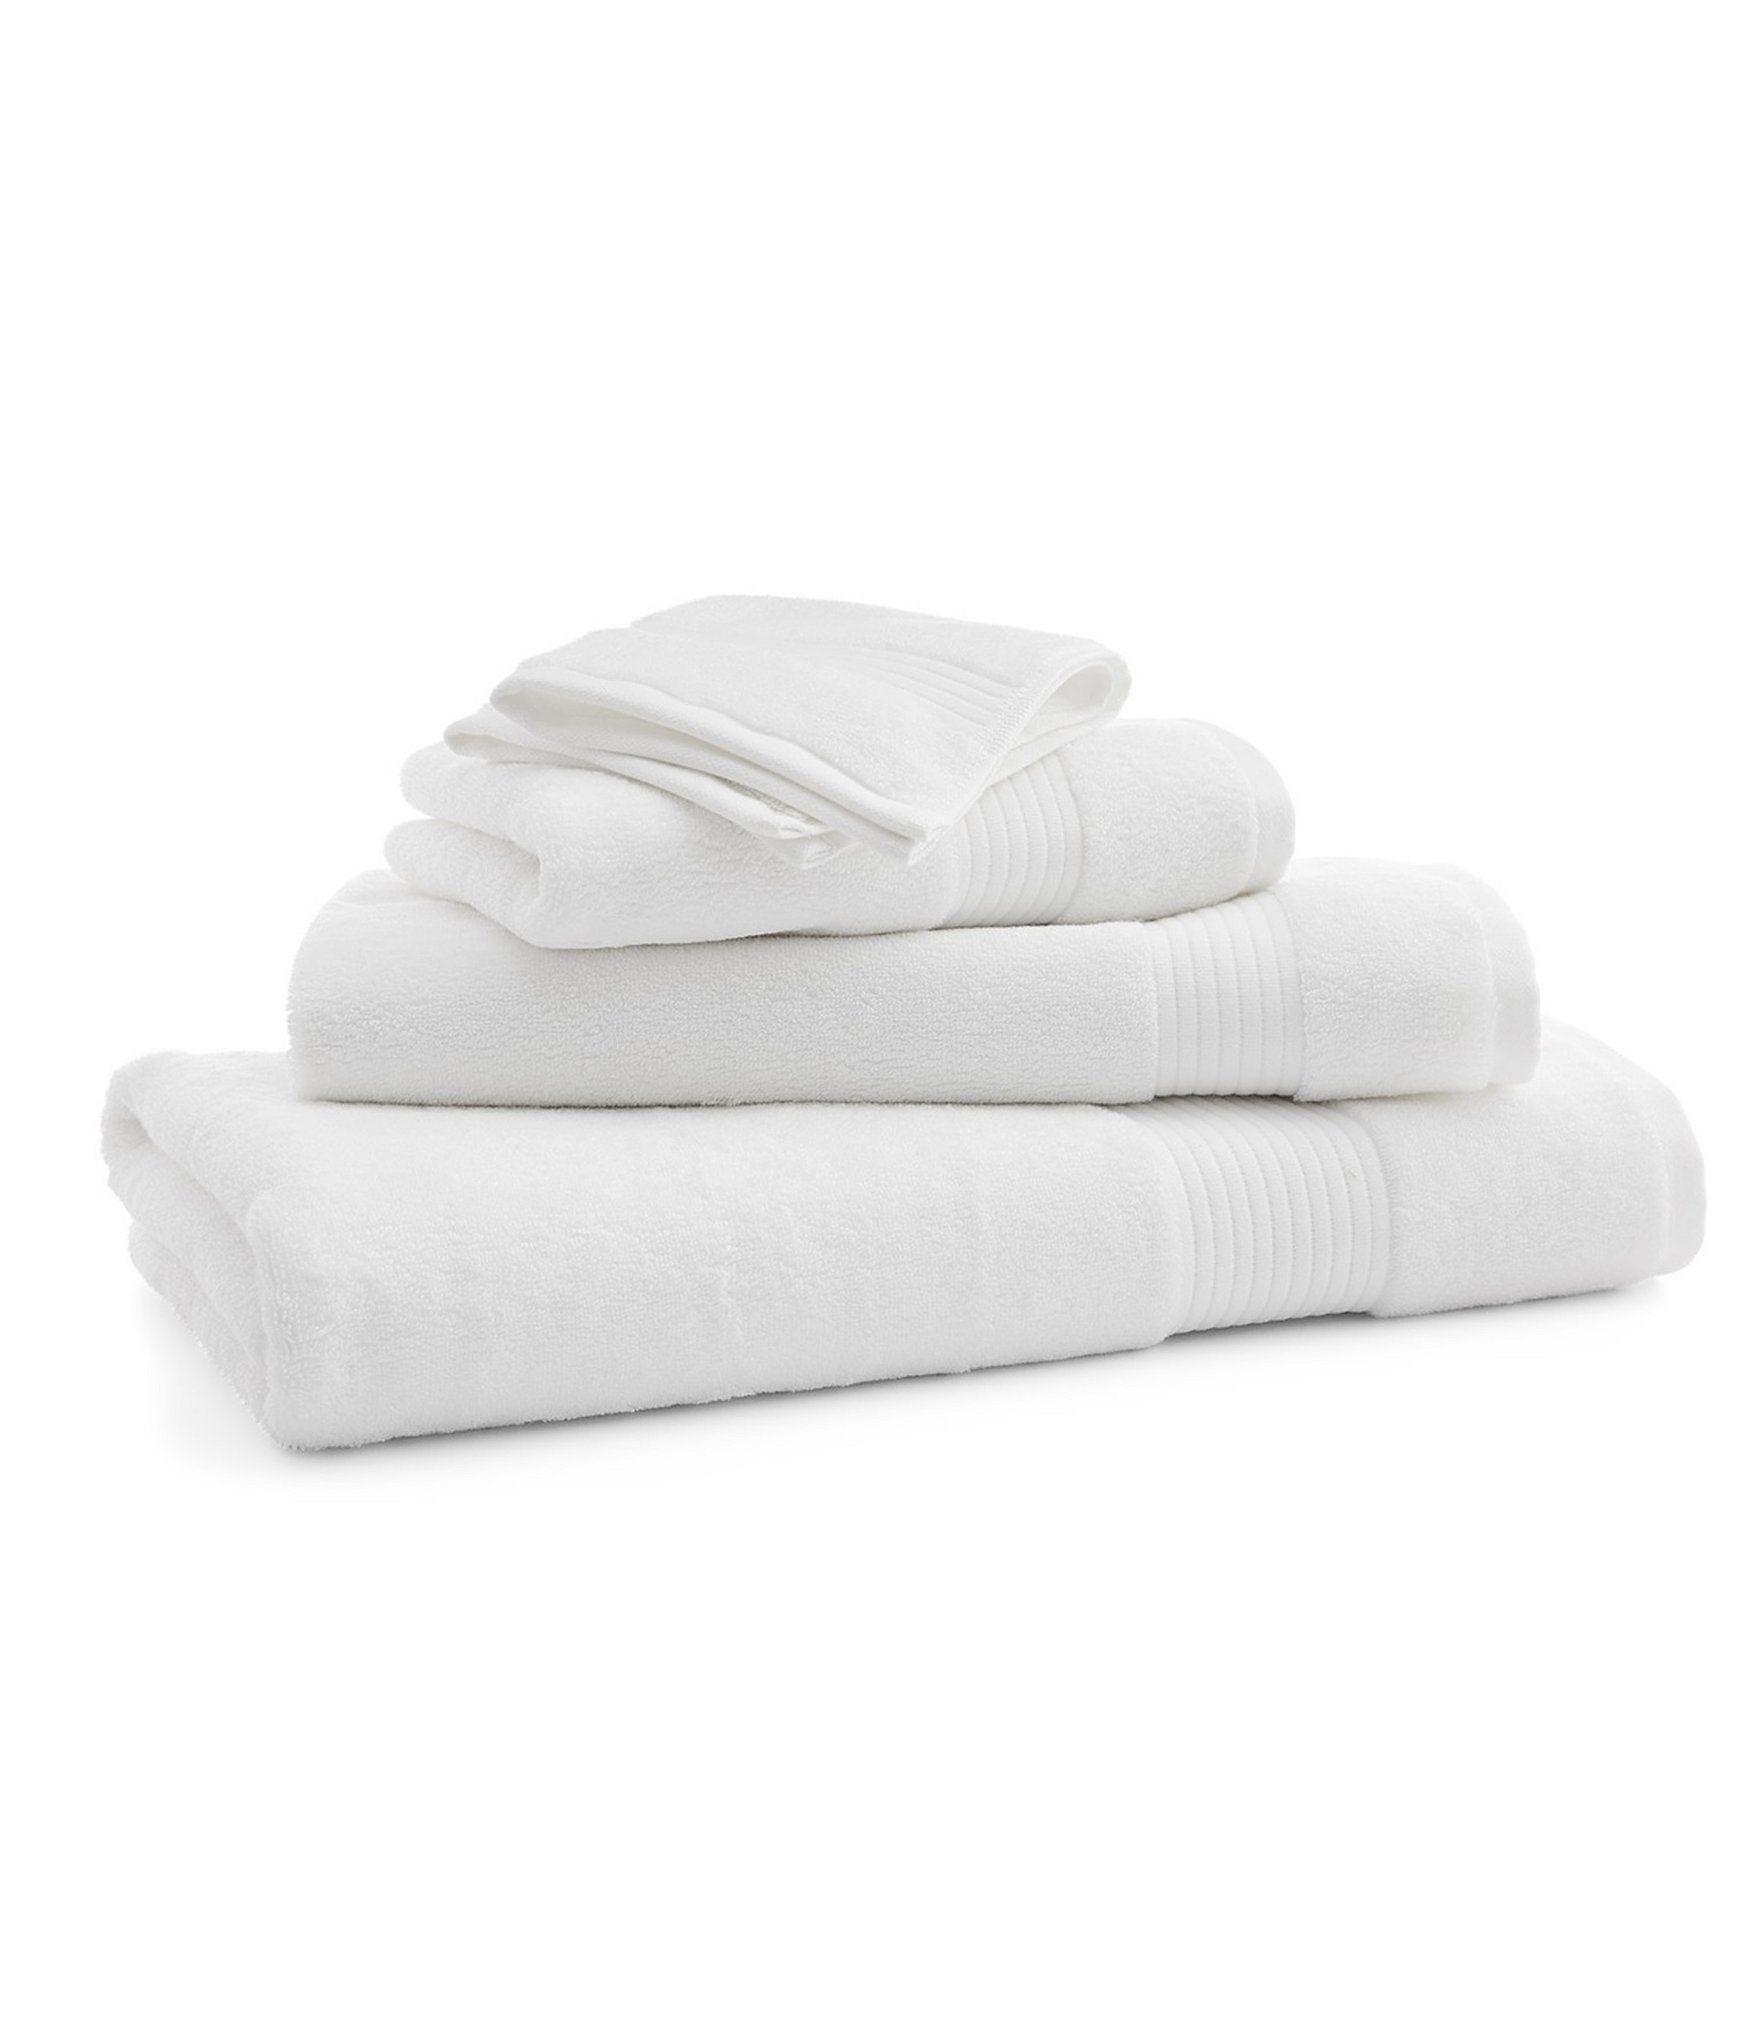 Ralph Lauren Bowery Bath Towels | Dillard's #handtowels